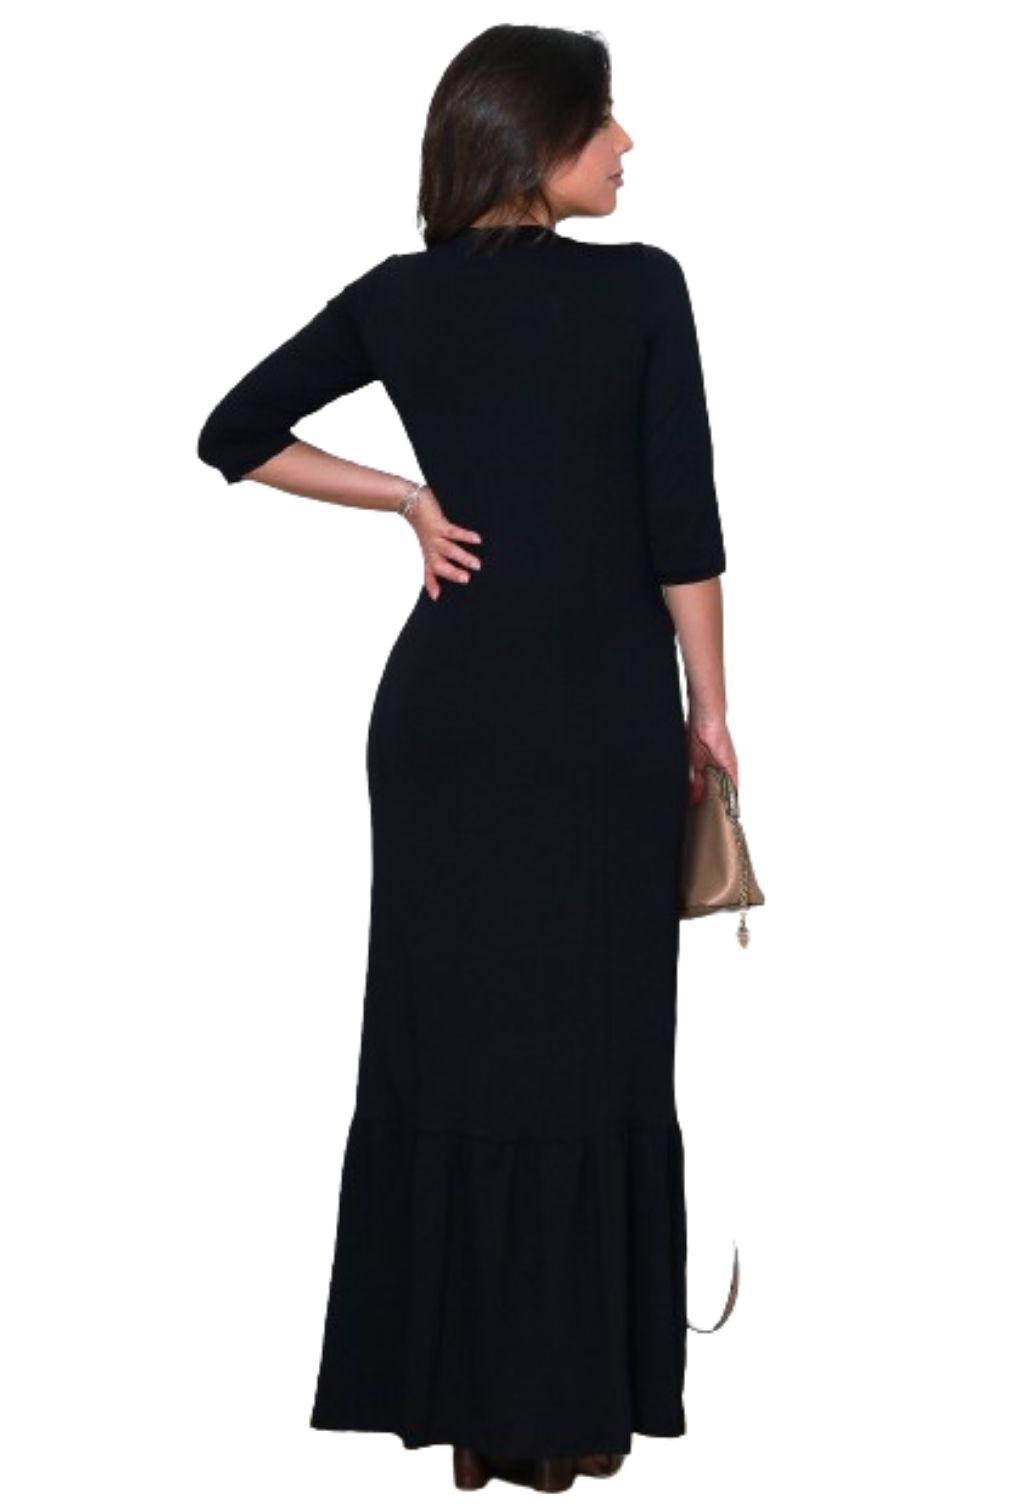 Vestido Longo Meia Estação Tendencia Feminino  - ModaStore | Moda Feminina